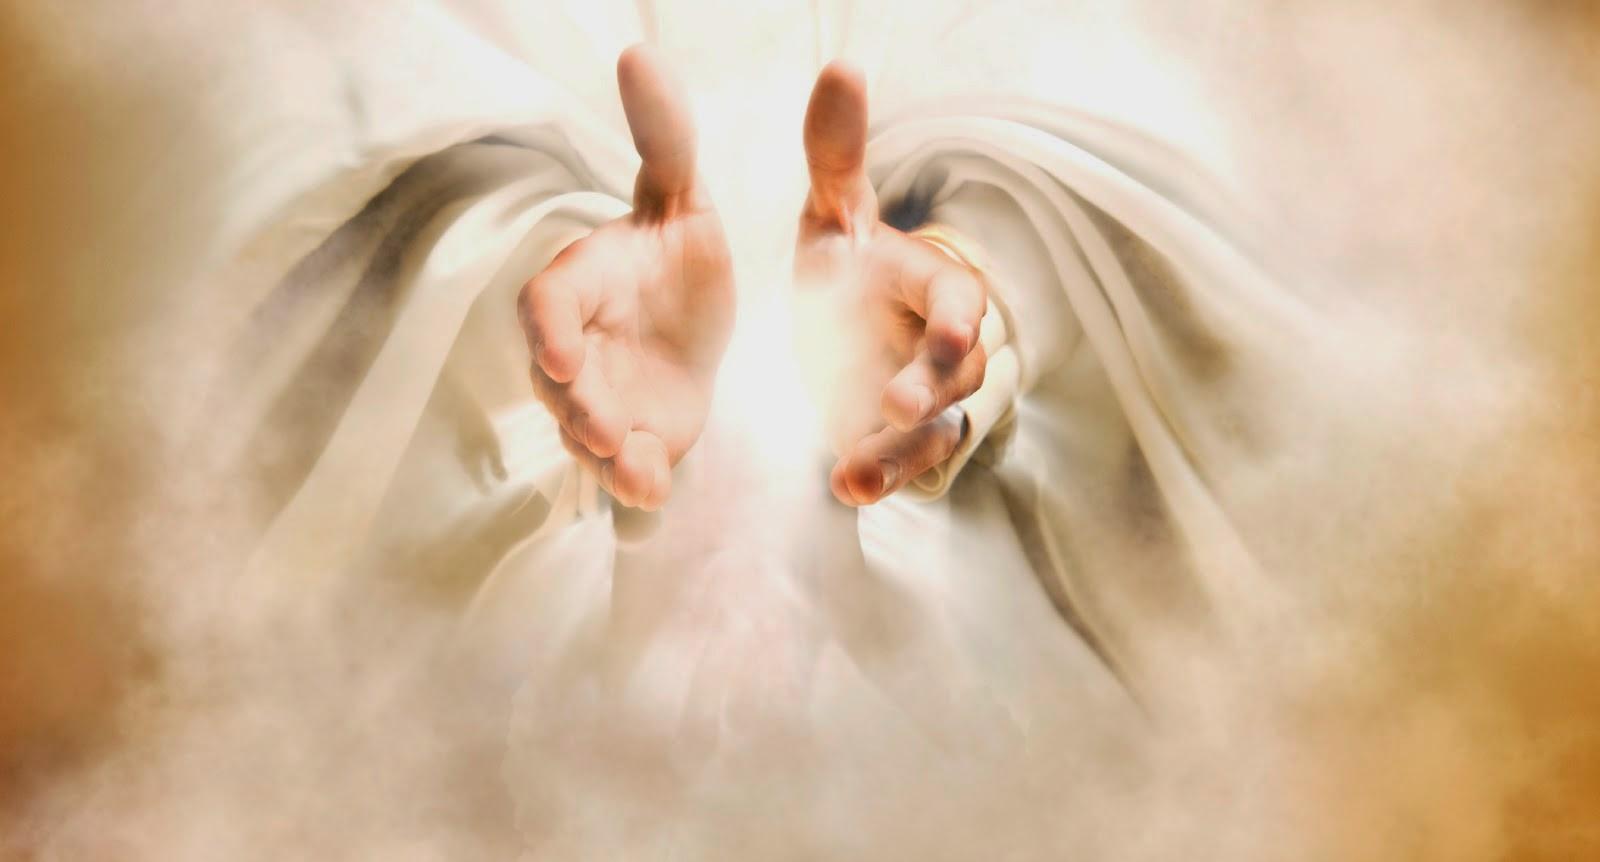 http://openarmsaustralia.org/wp-content/uploads/2015/02/jesus-hands.jpg